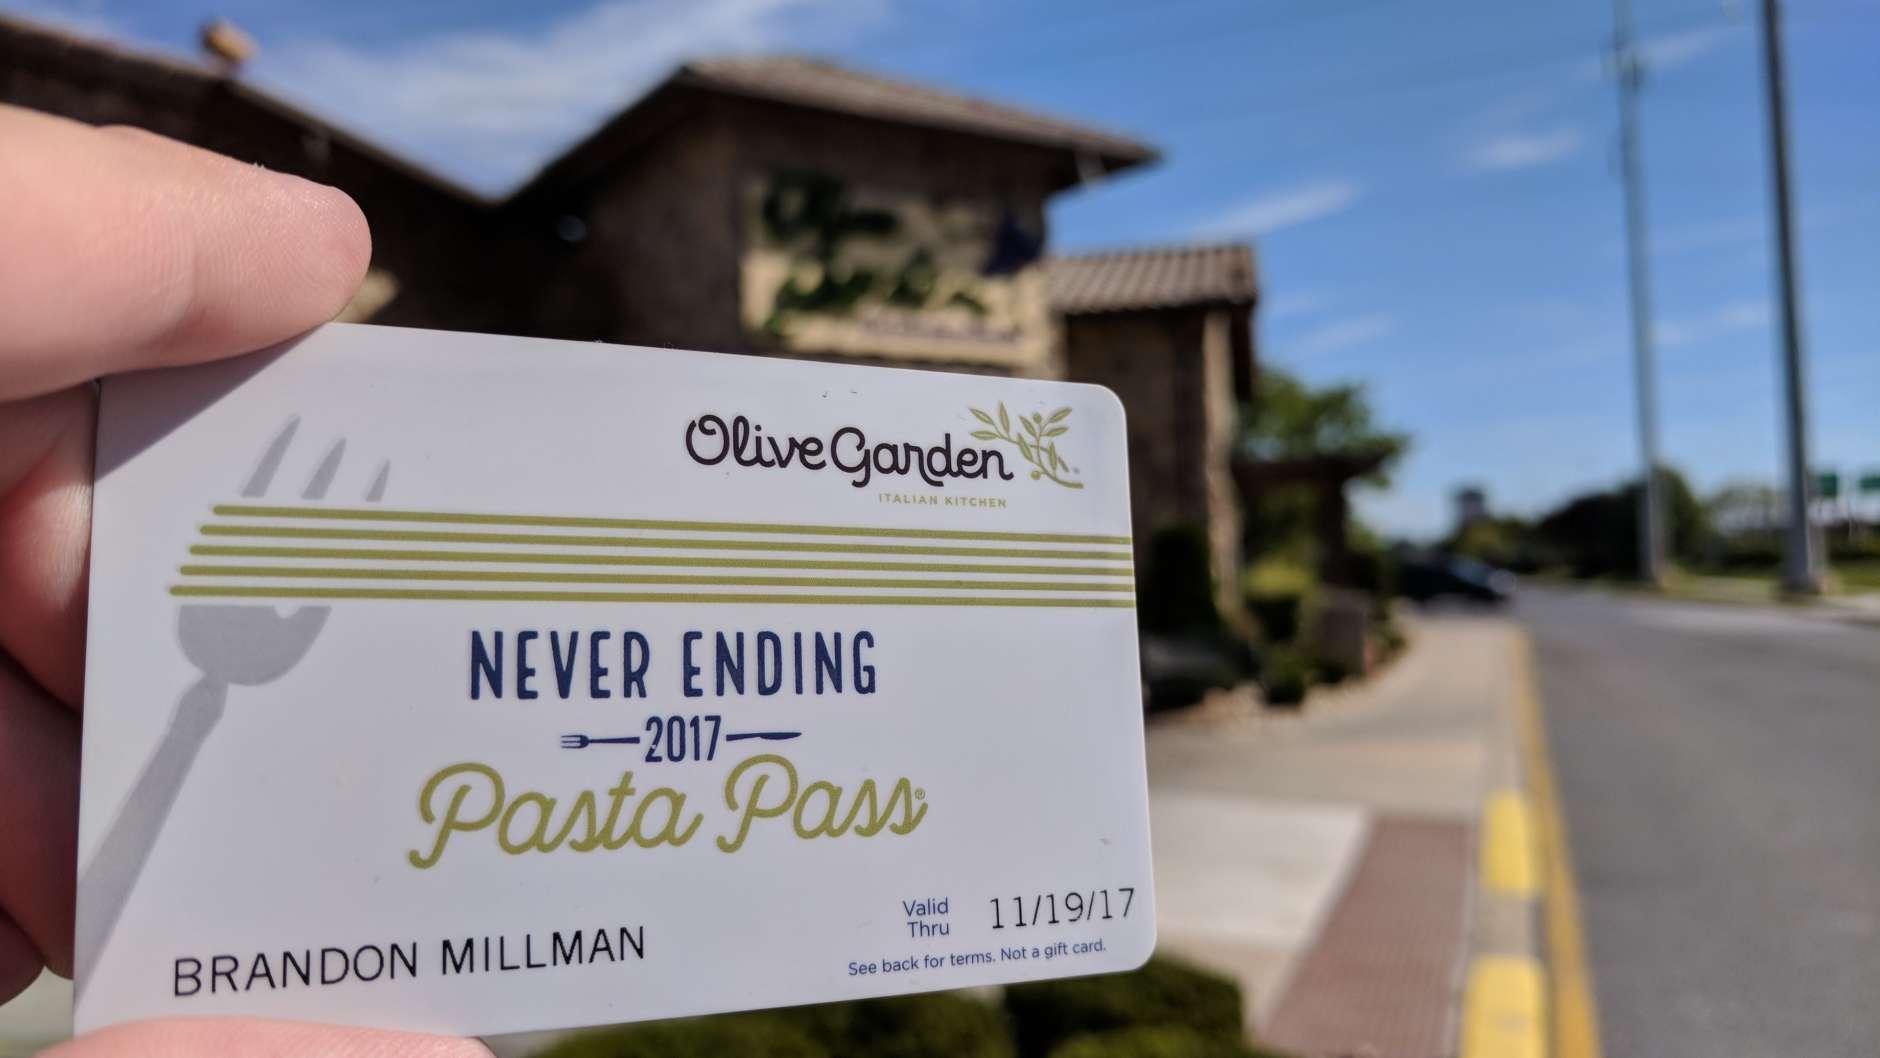 WTOP's Brandon Millman brandishes his Never Ending Pasta Pass outside the Newark, Delaware Olive Garden. (WTOP/Brandon Millman)